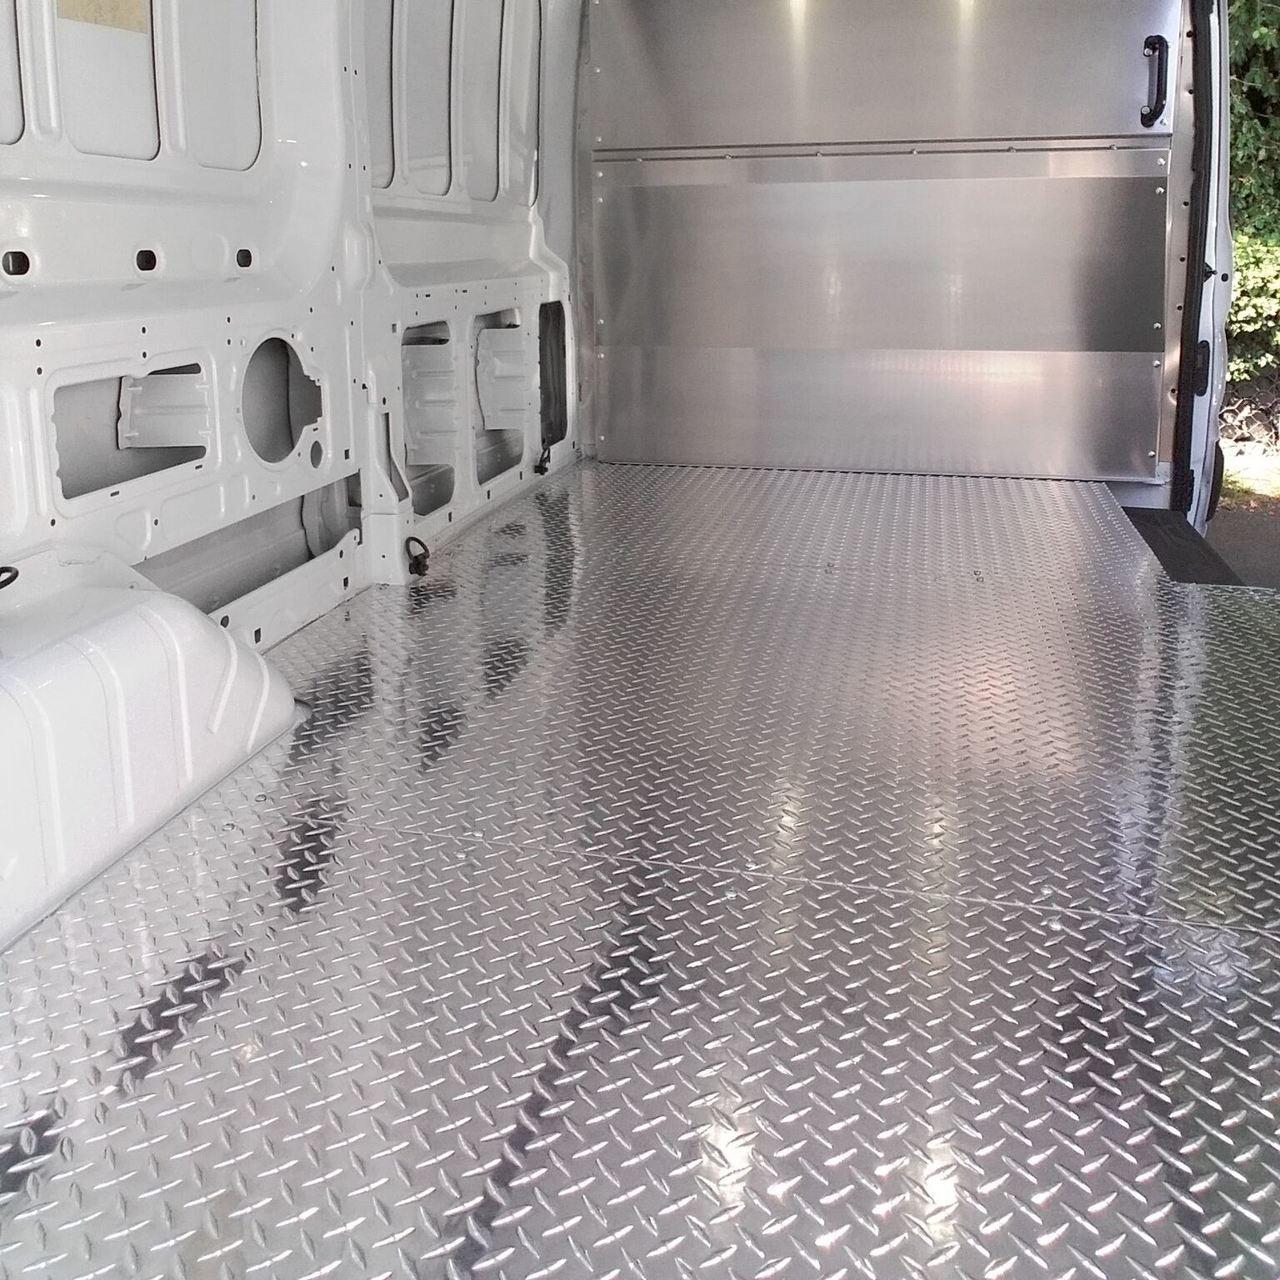 Transit Diamond Plate Aluminum Floor